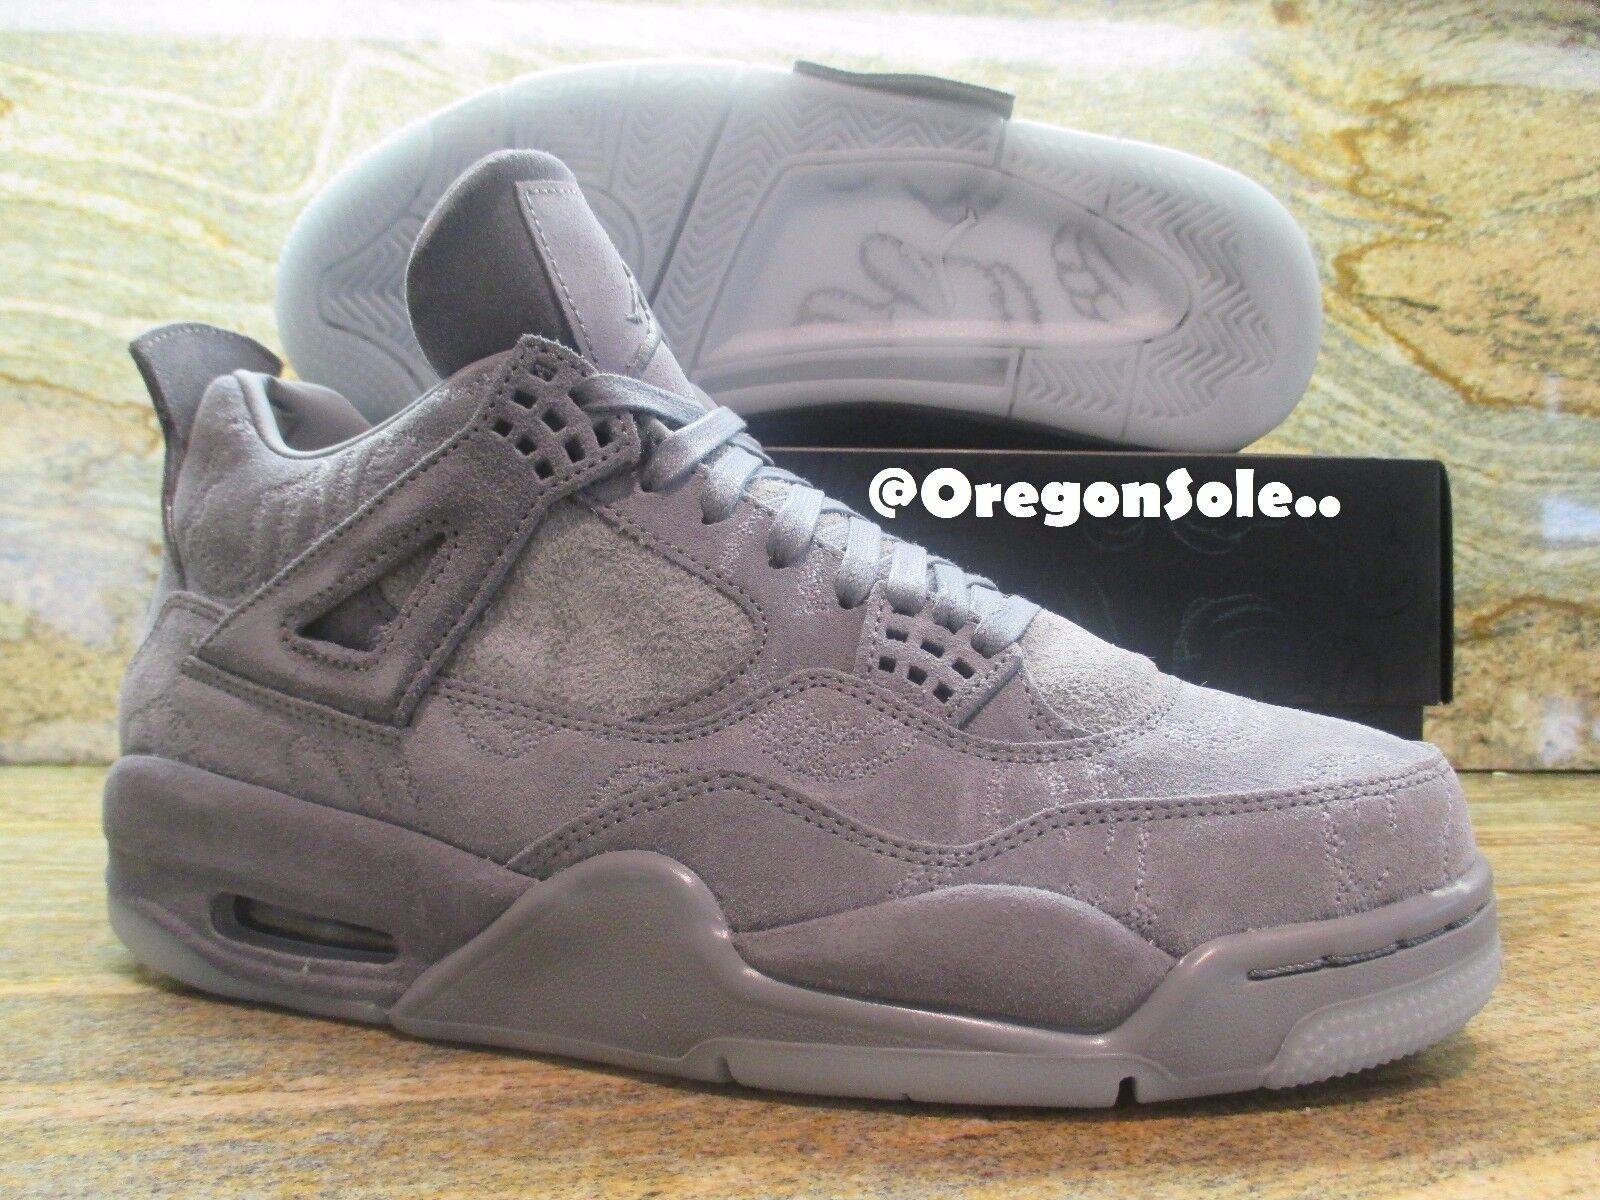 Nike air jordan 4 iv retr kaws sz 8,5 8,5 8,5 cool grey brilla nel buio 930155-003 camoscio 7ac50f